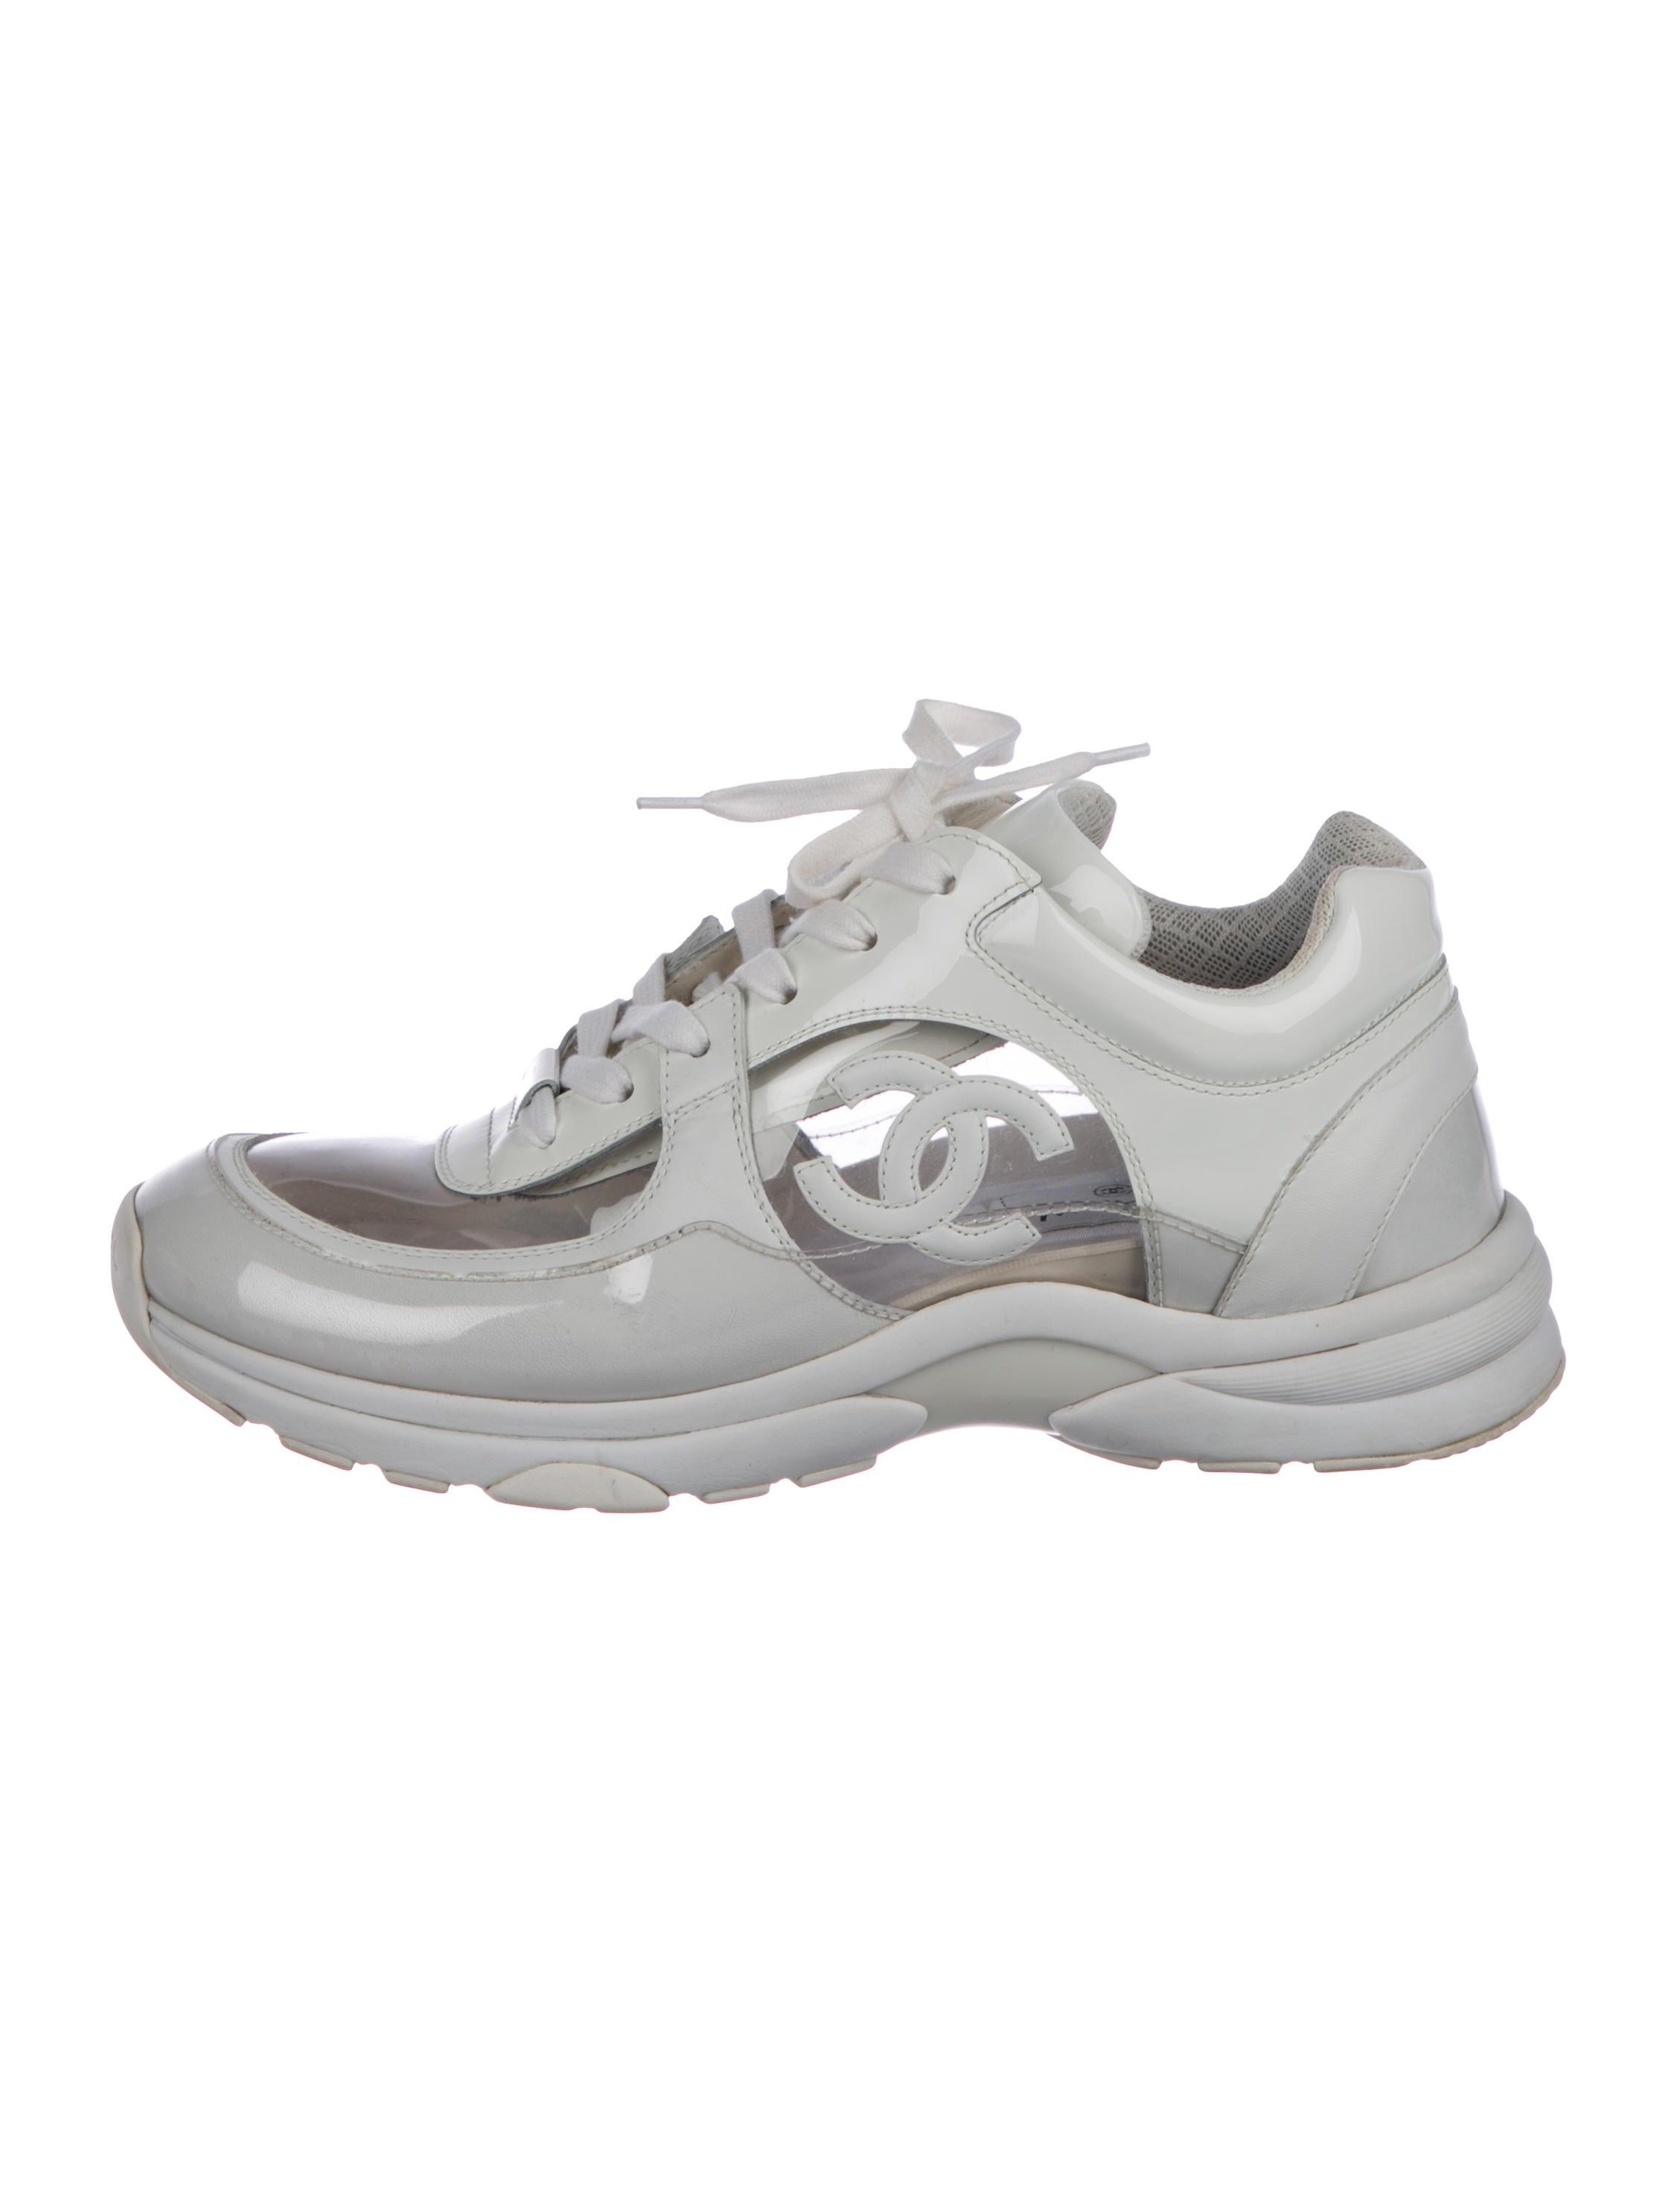 Chanel 2018 CC PVC Sneakers - Shoes